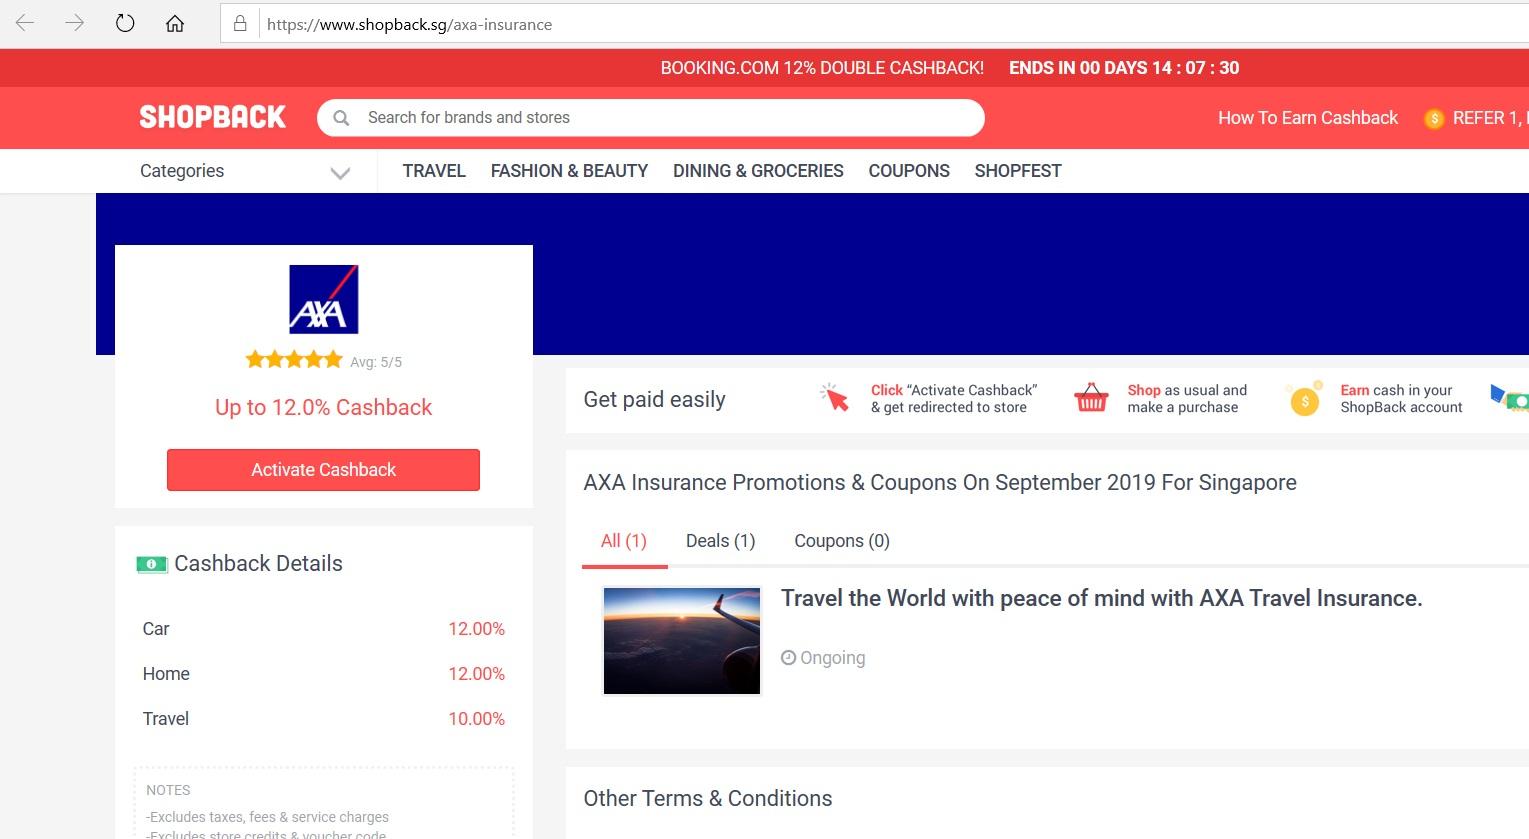 AXA Insurance page on ShopBack website.